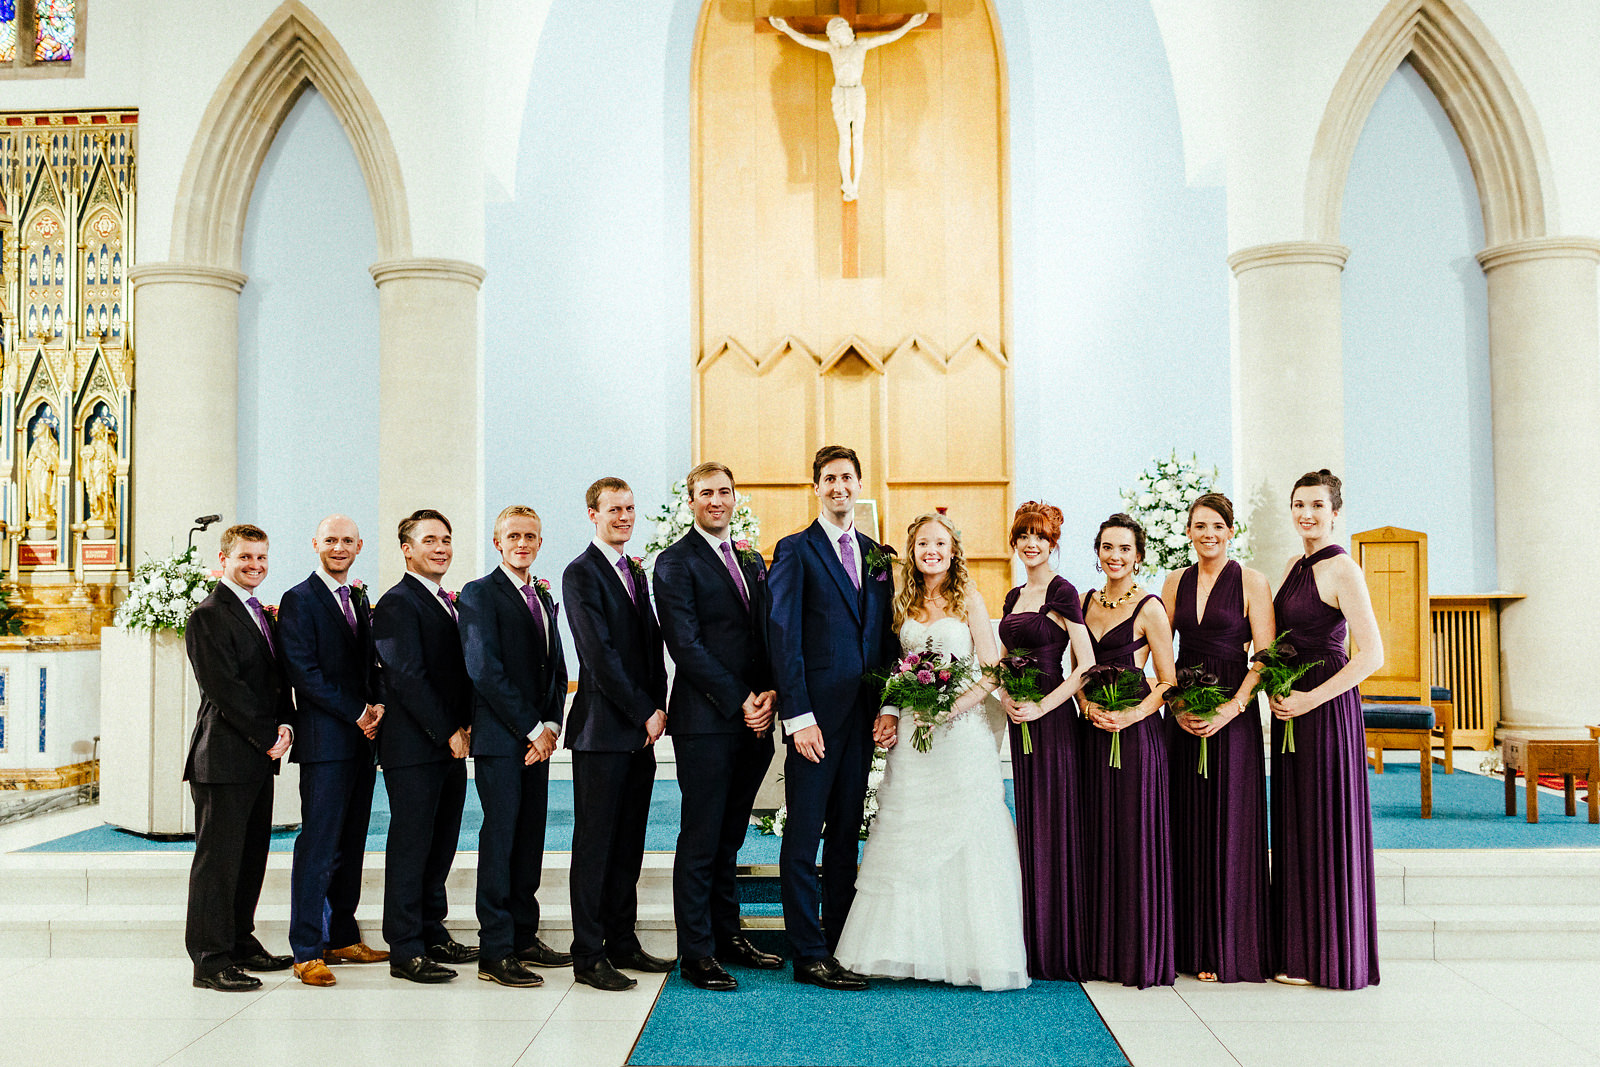 St Joseph's catholic church wedding ceremony